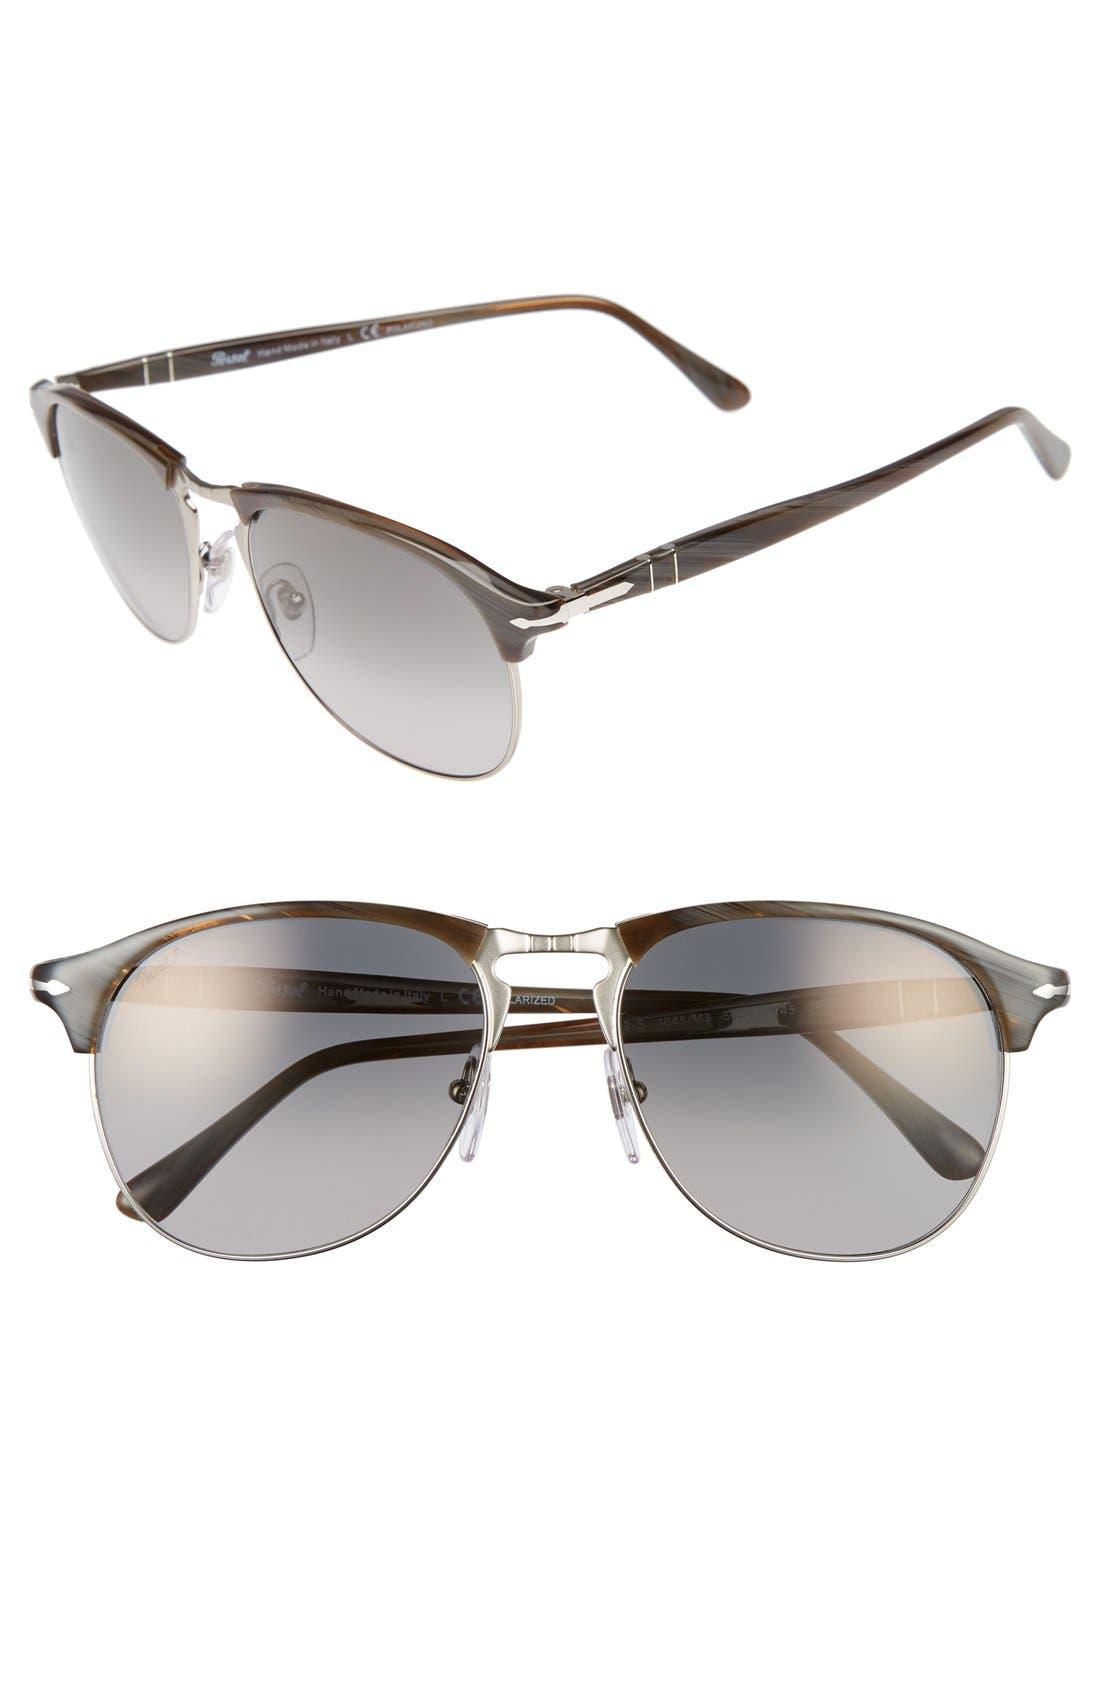 cdd1834218 Persol 5m Keyhole Sunglasses -